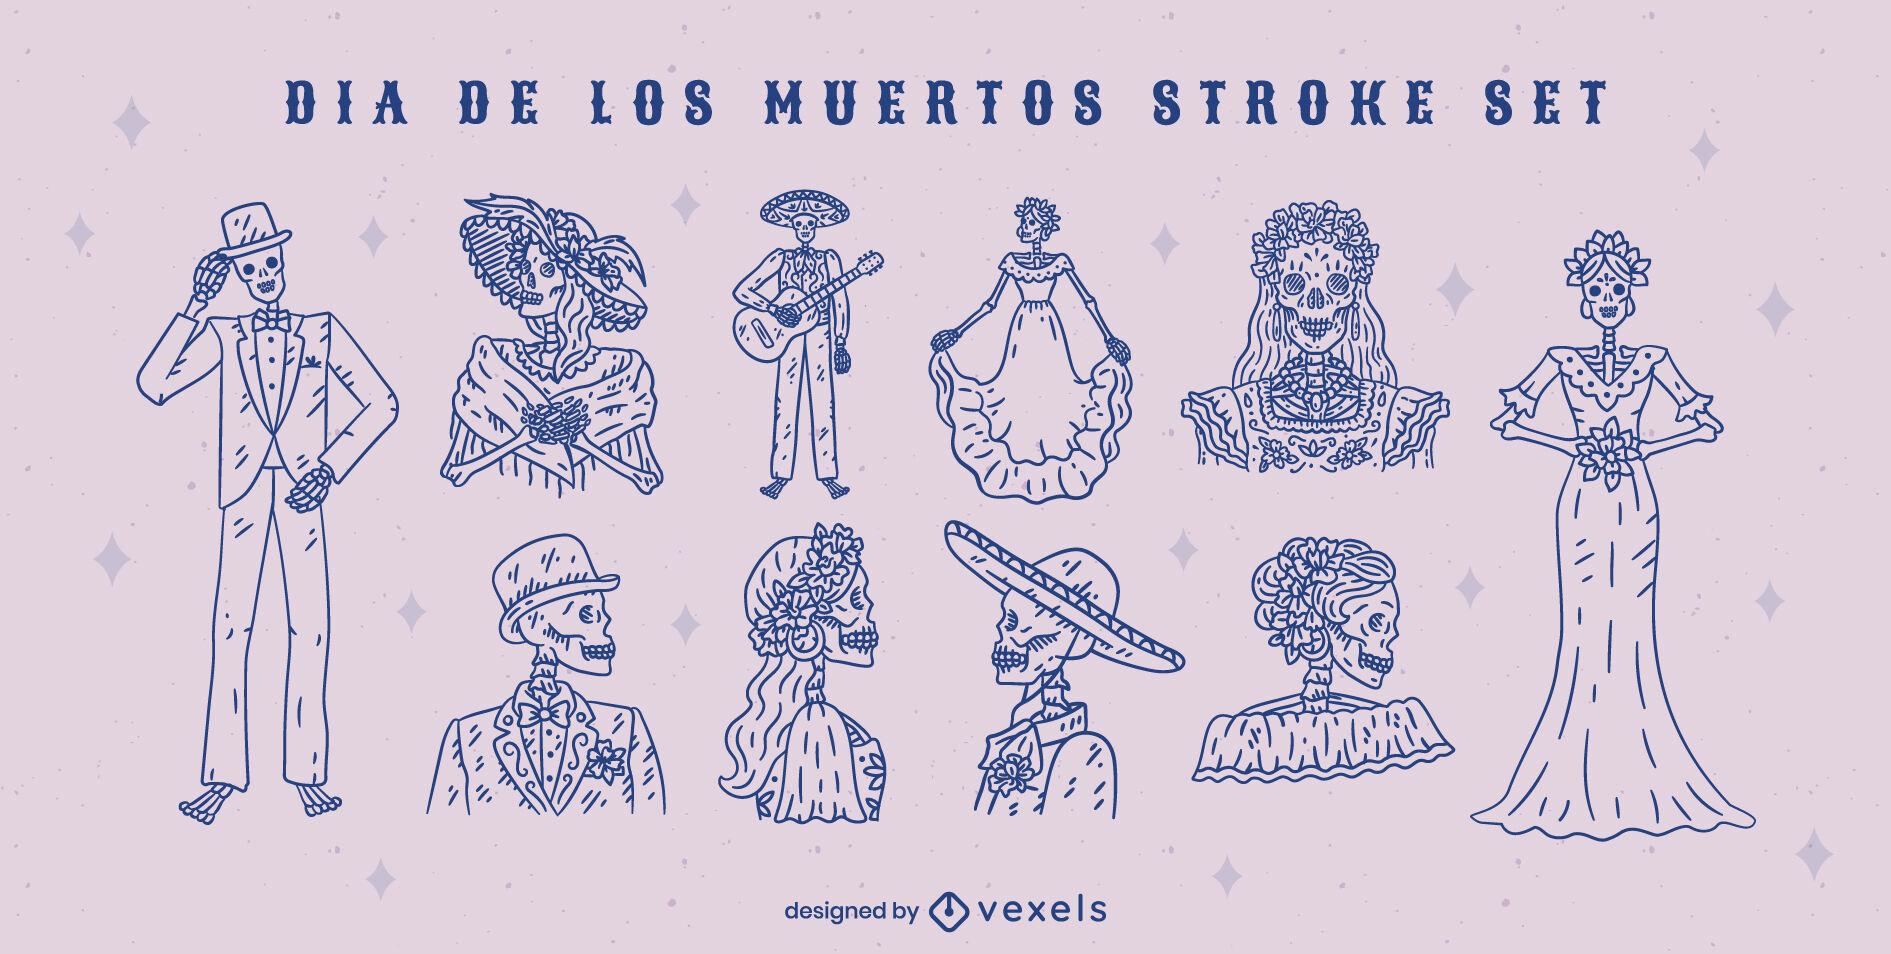 Day of the dead skeleton people stroke set